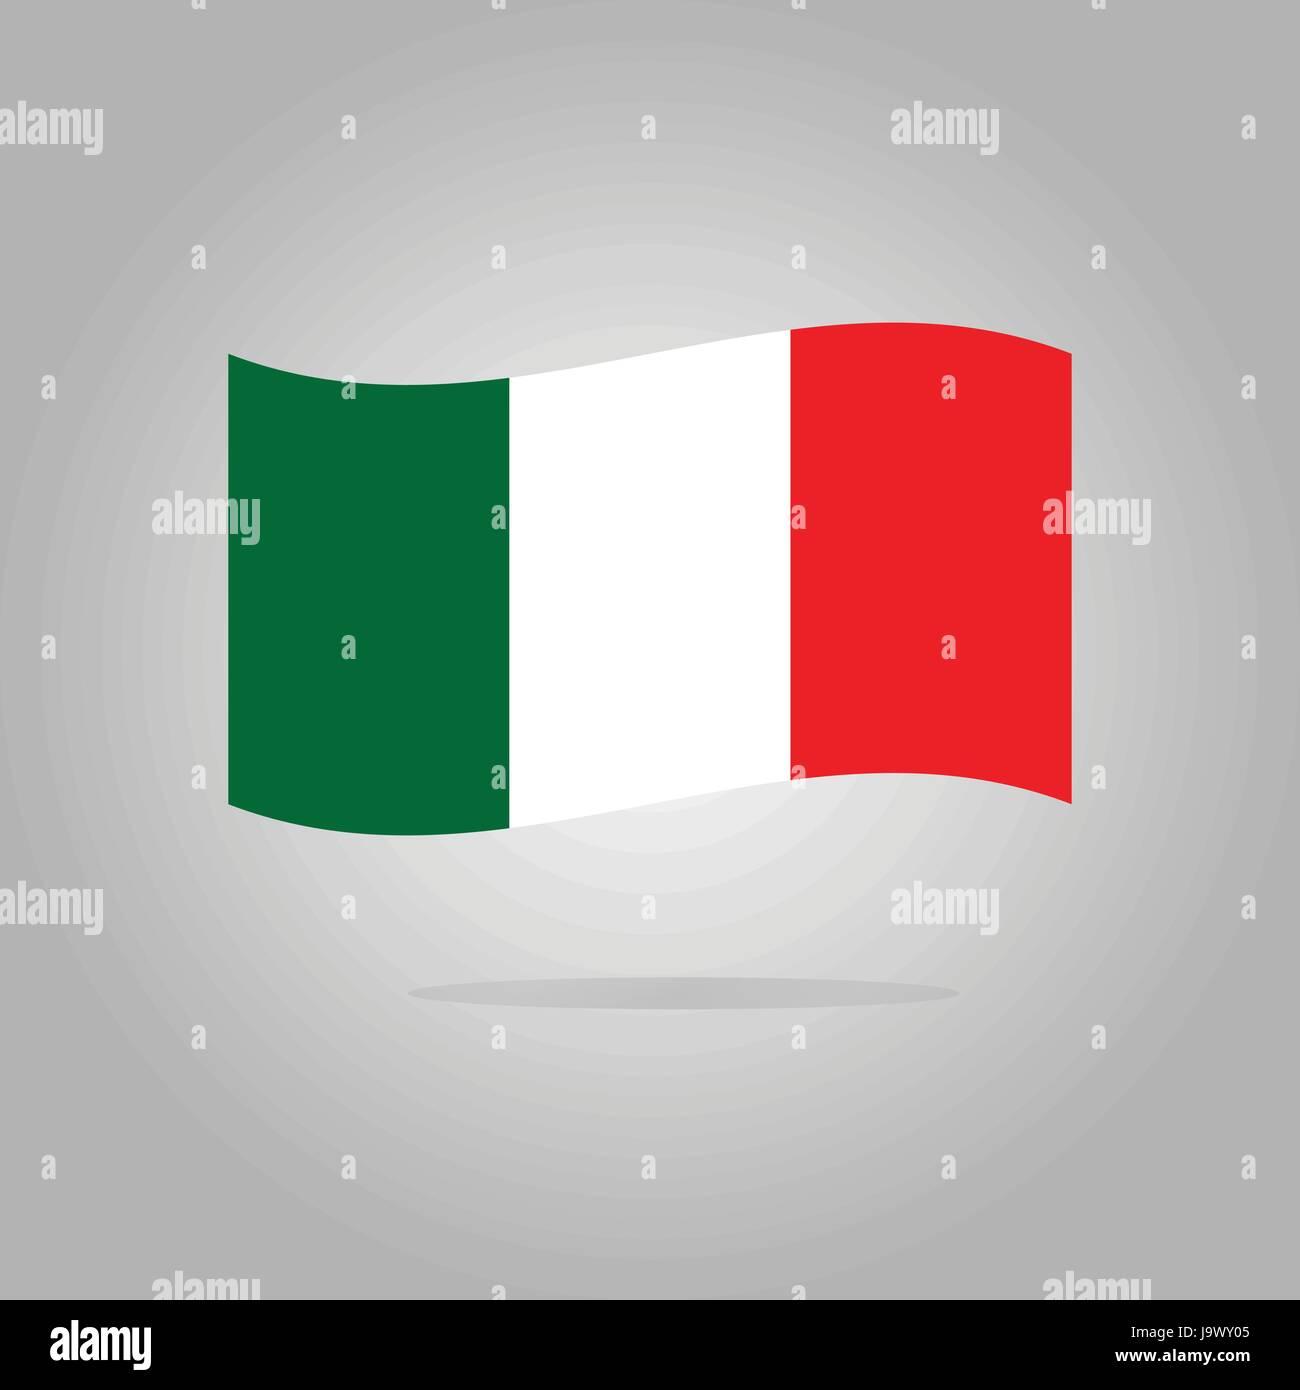 Italy flag design illustration - Stock Image